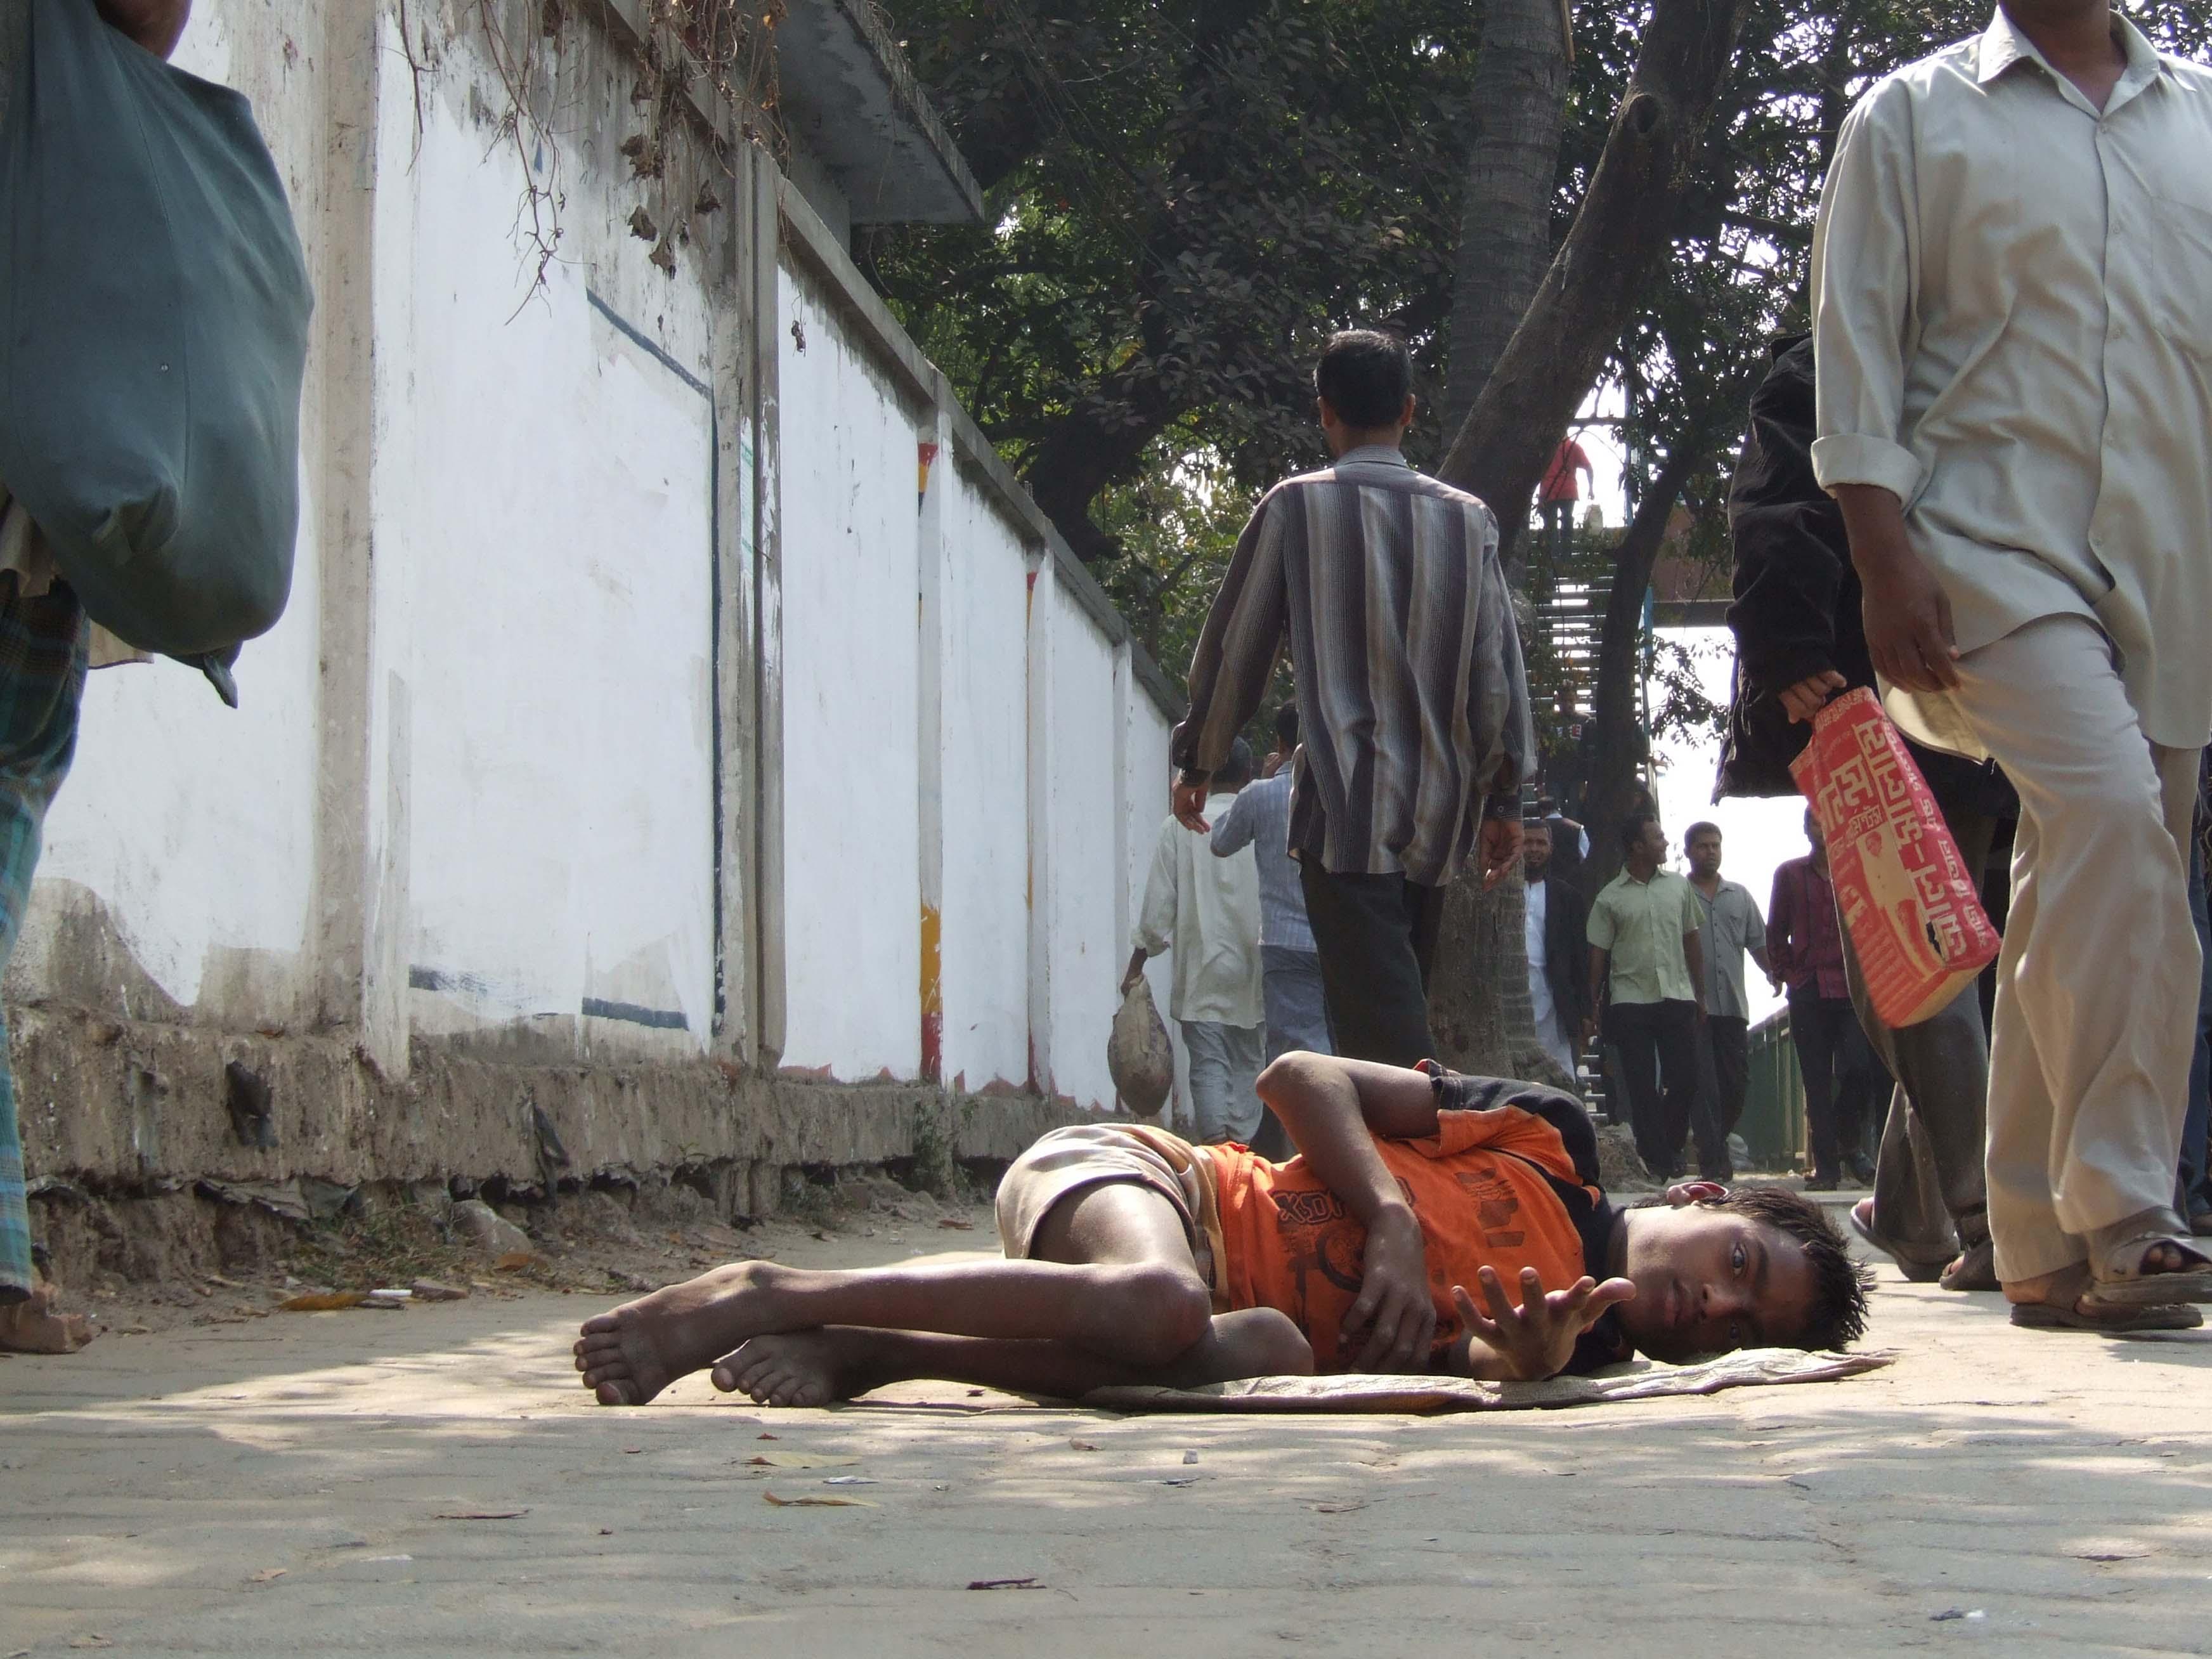 Disabled beggar in Dhaka, Bangladesh.